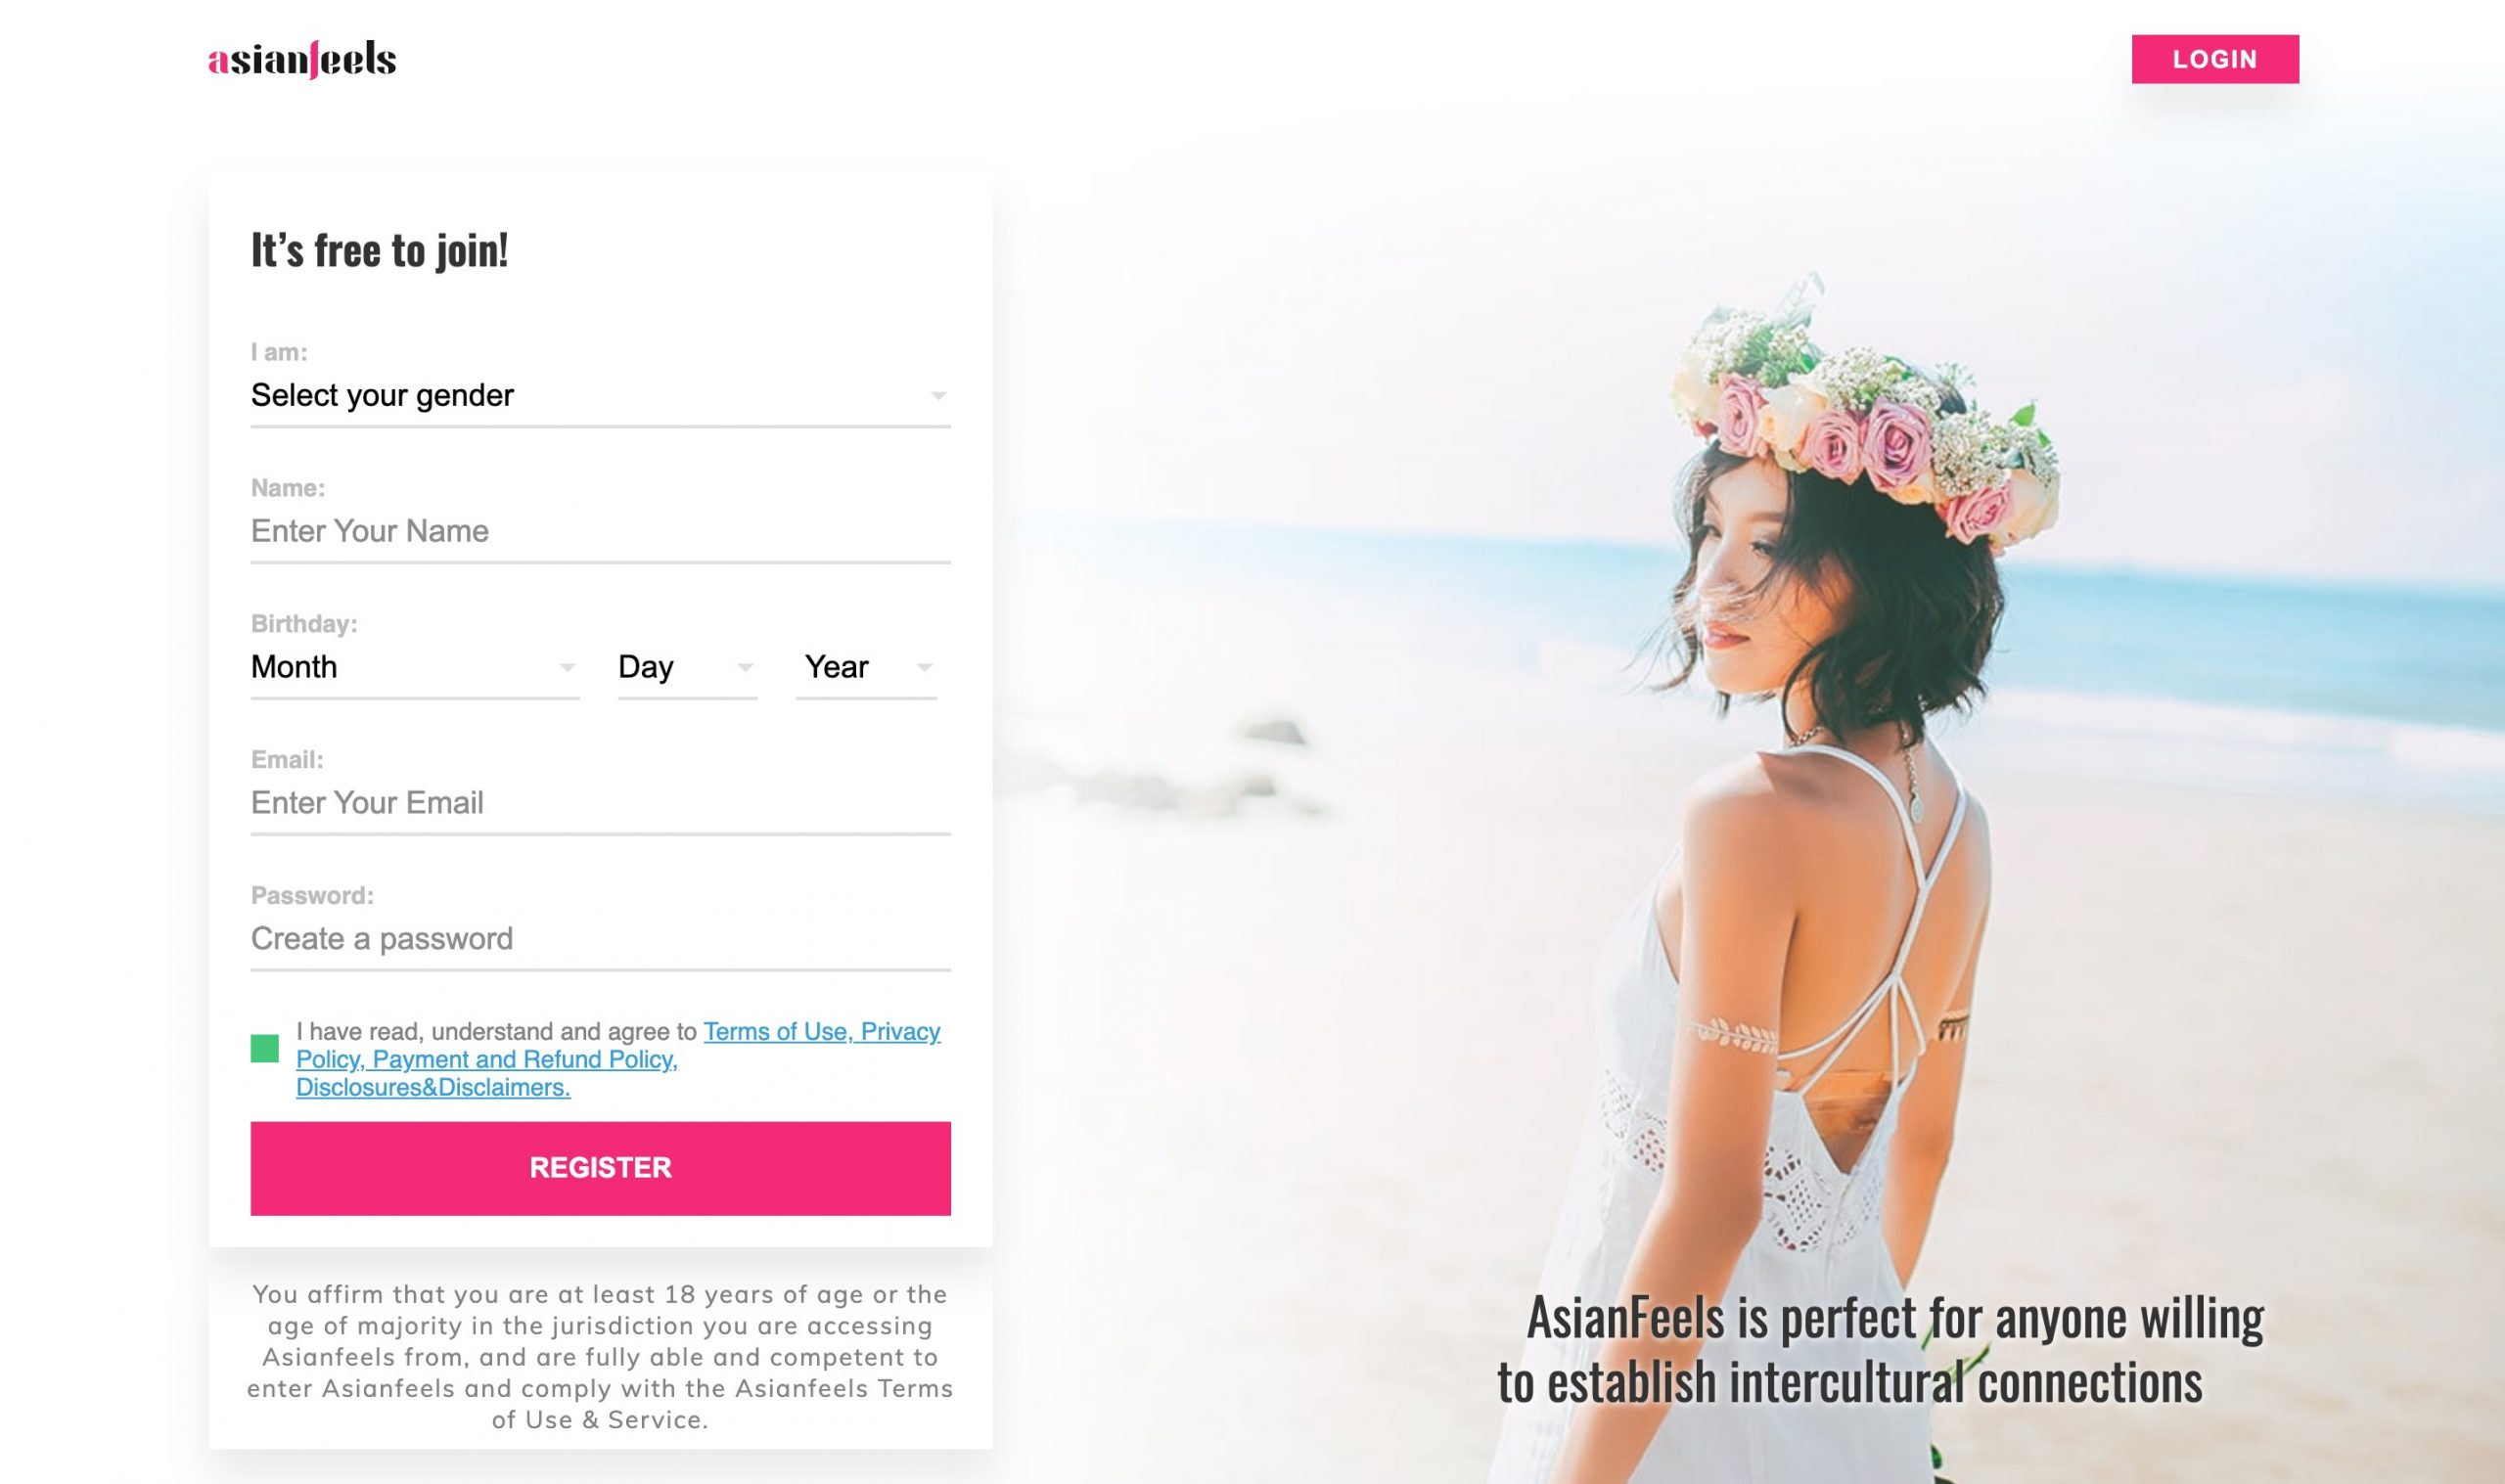 AsianFeels main page